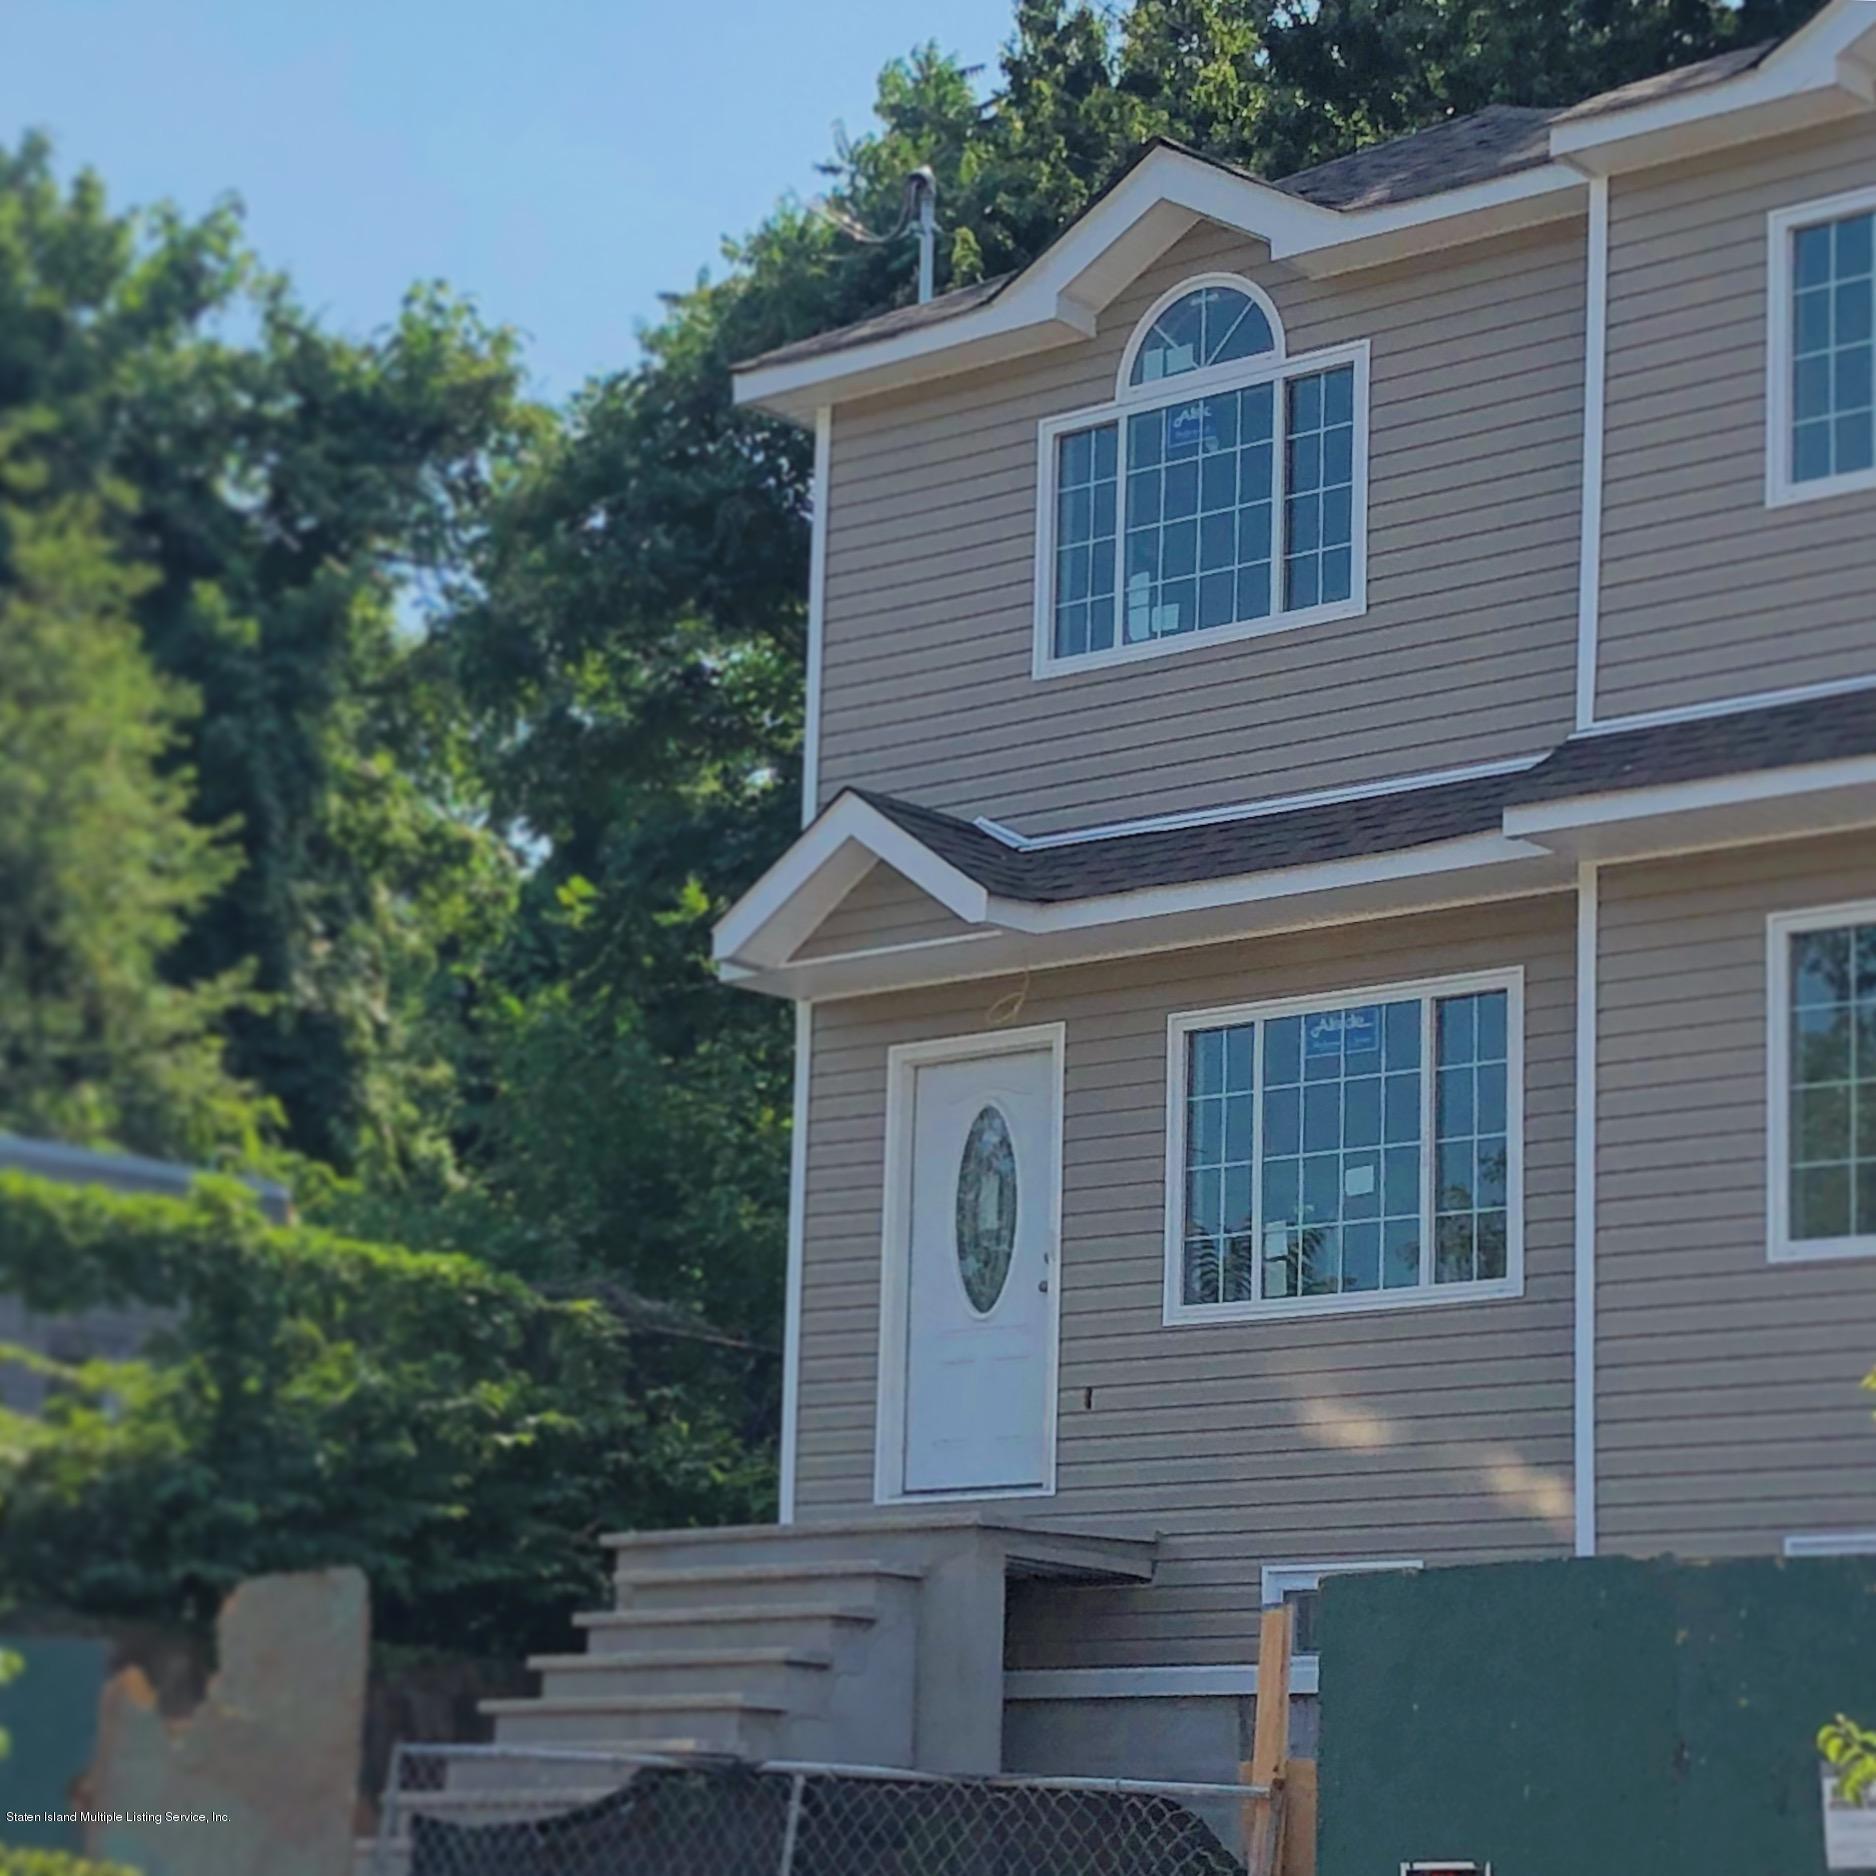 Single Family - Semi-Attached 254 York Avenue  Staten Island, NY 10301, MLS-1124069-5